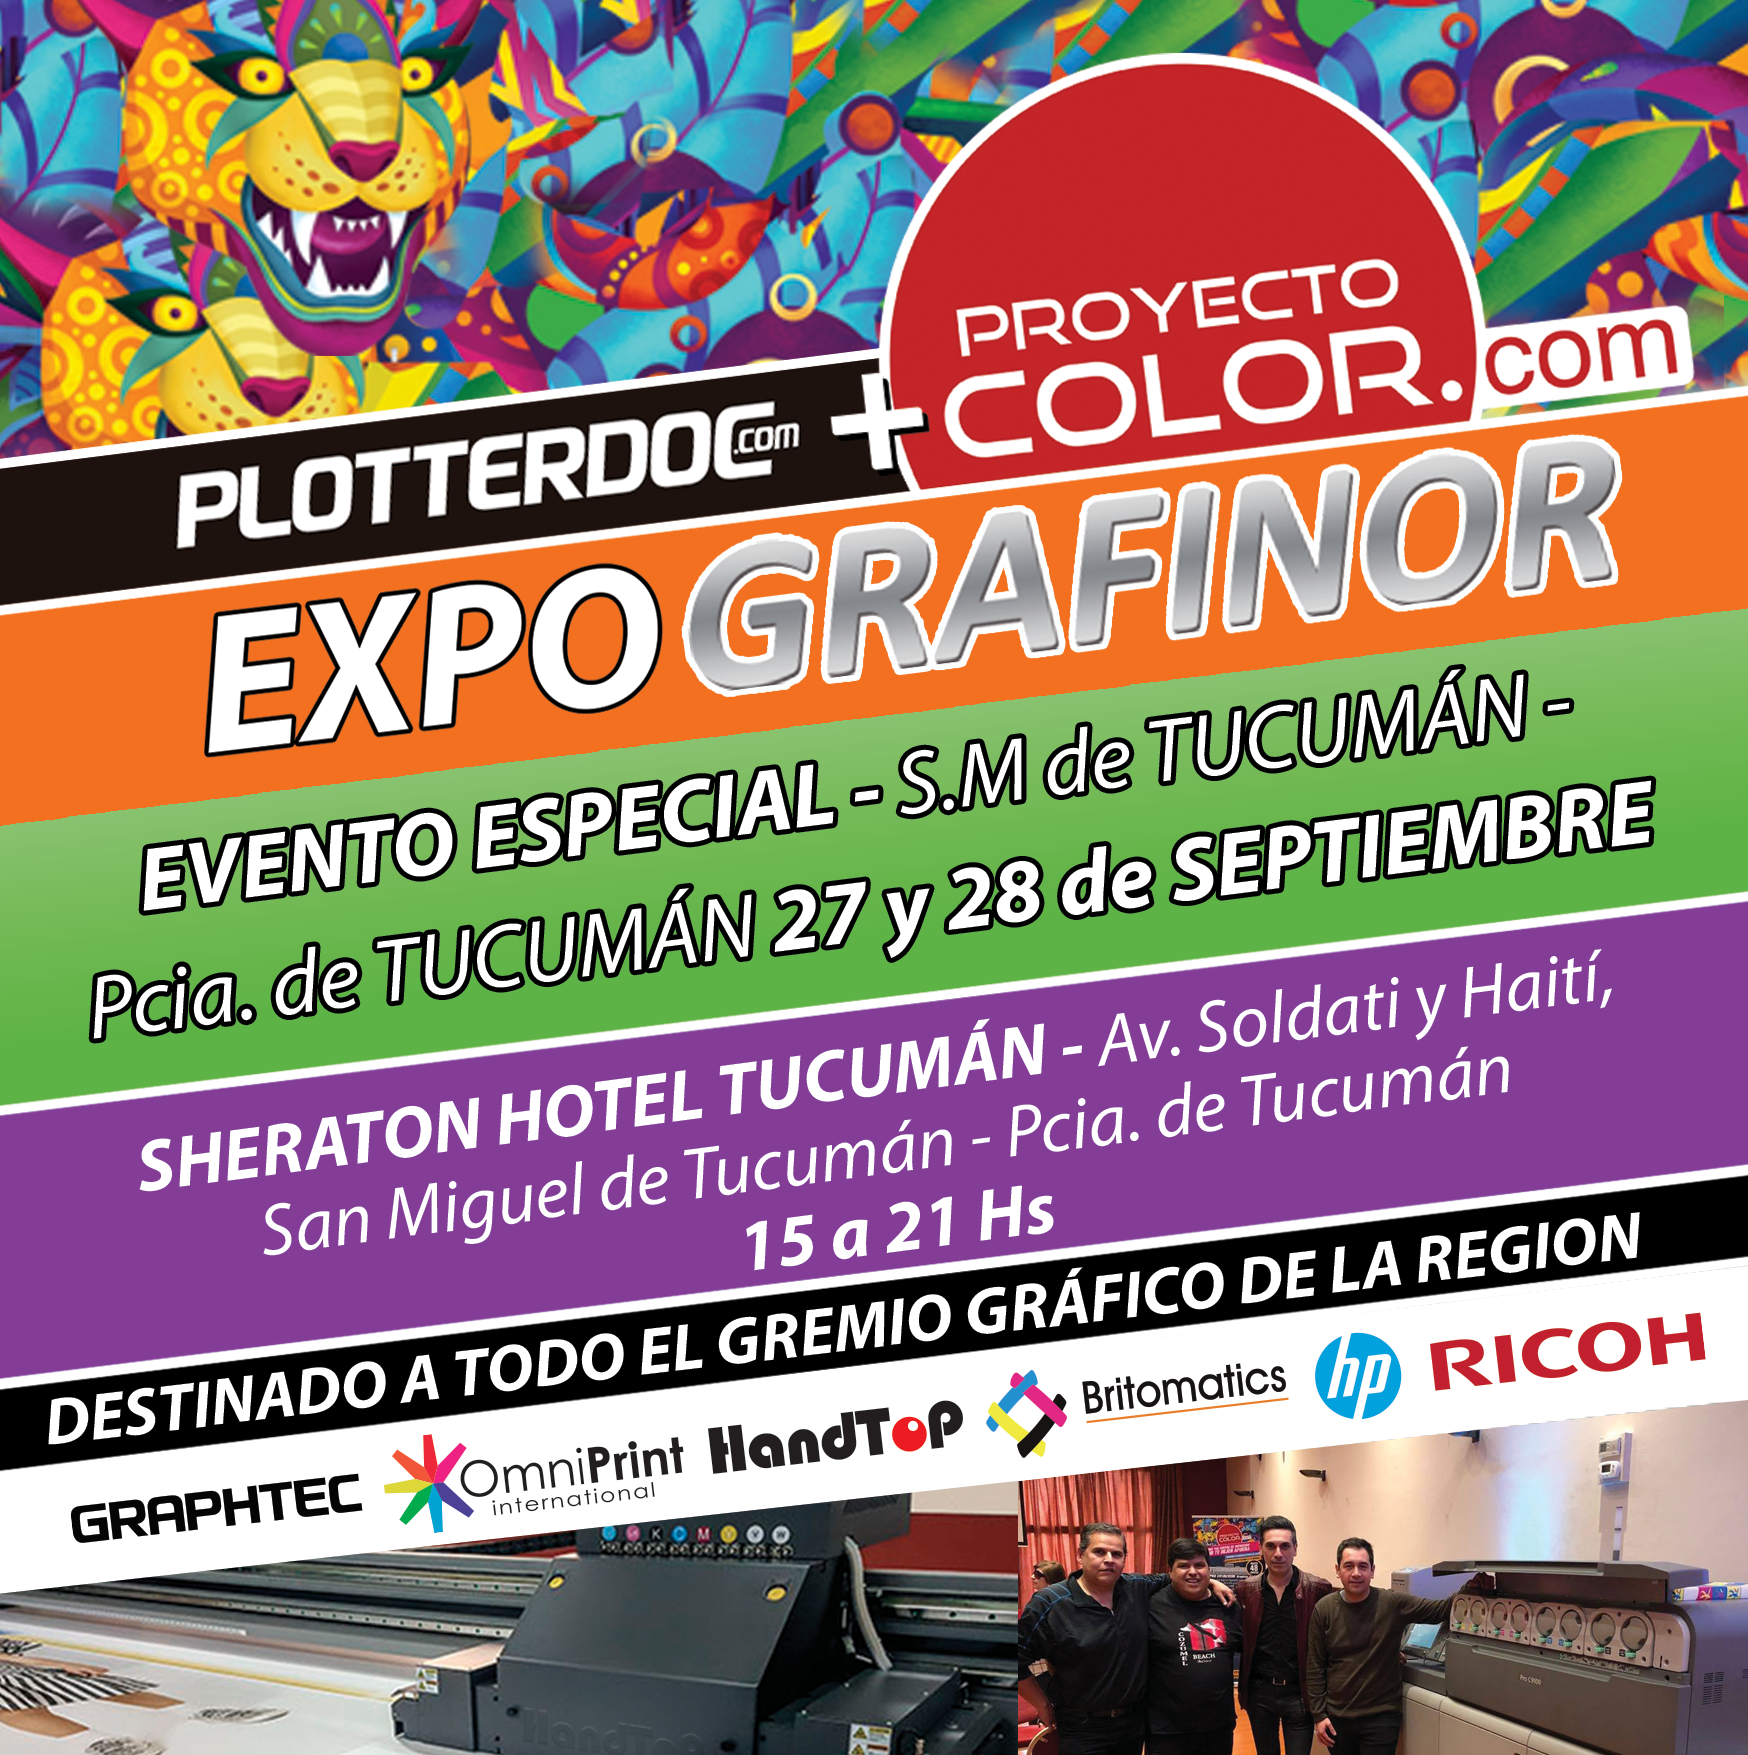 ¡Vení a vernos en Tucumán!